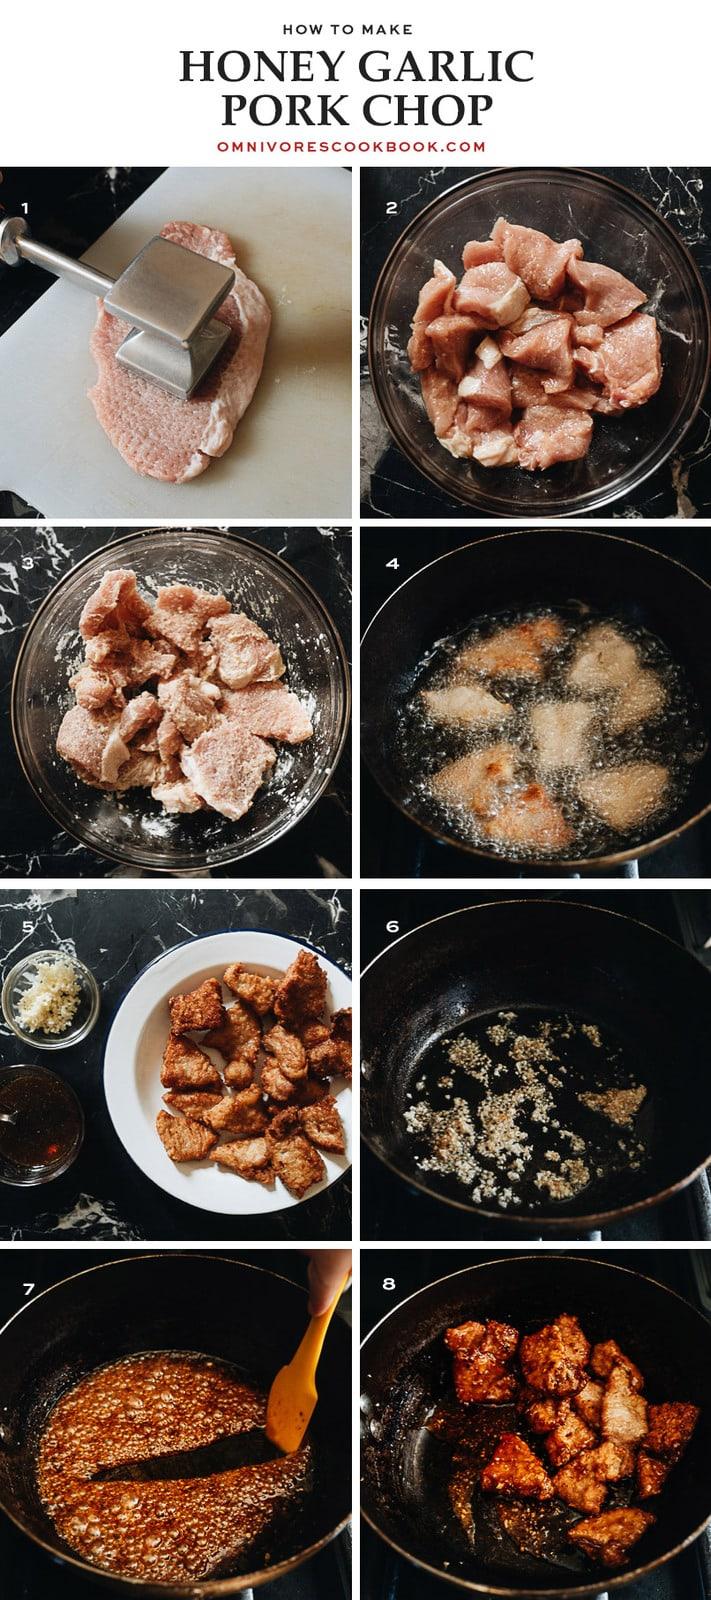 How to make honey garlic pork chop step-by-step